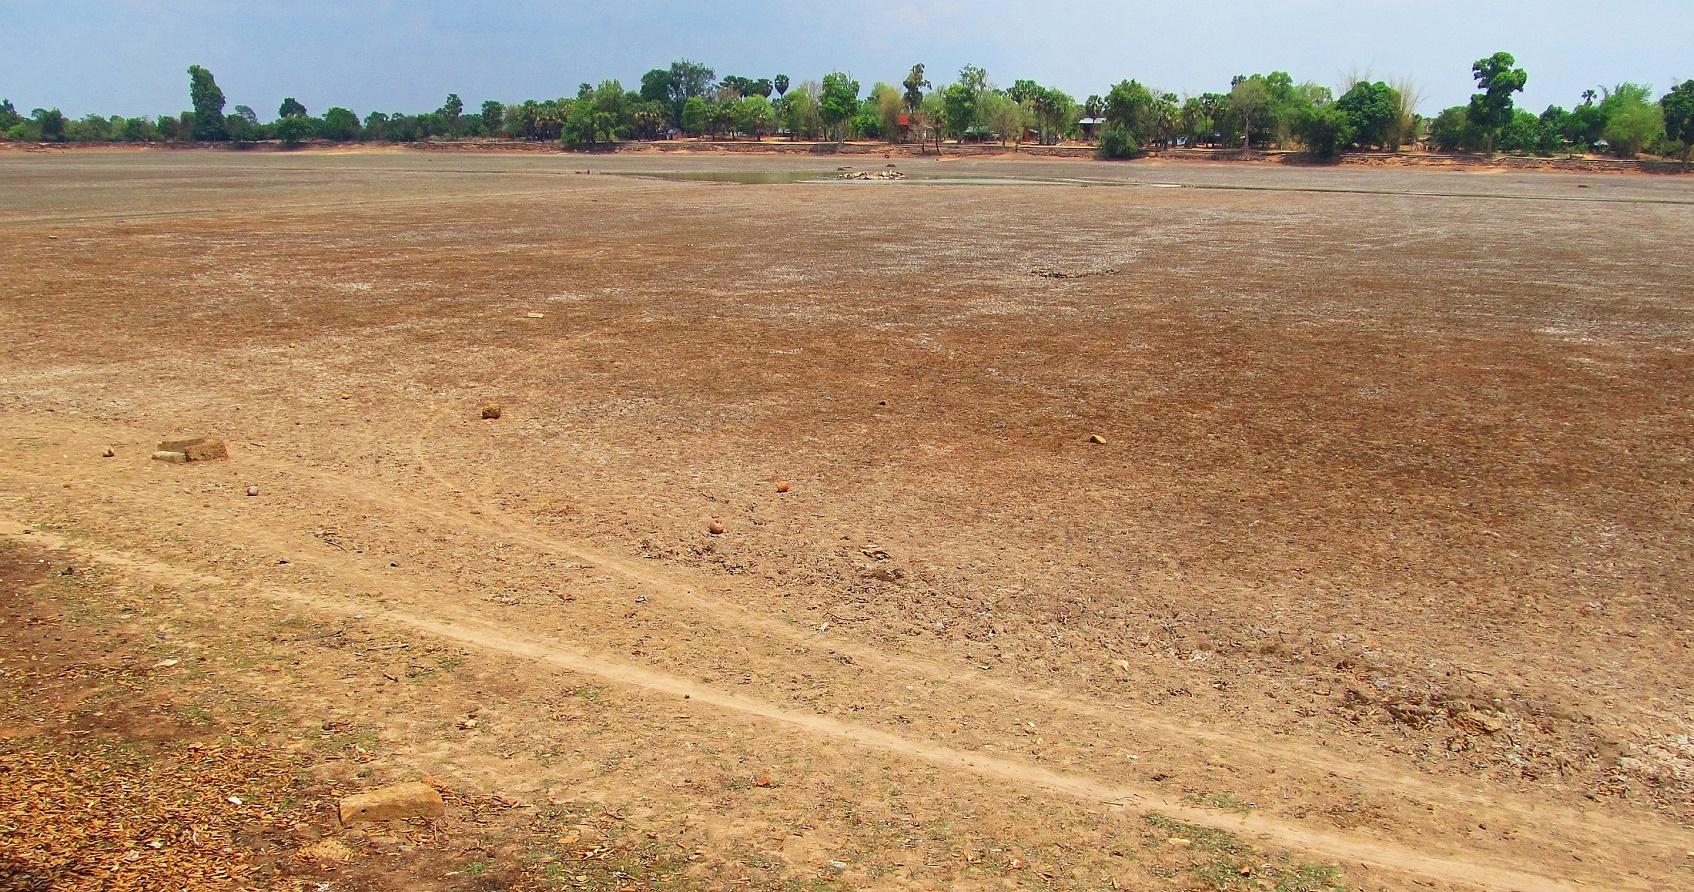 Duben 2016 Bývalá klidná vodní plocha nádrže Srah Srang - Angkor - Kambodža